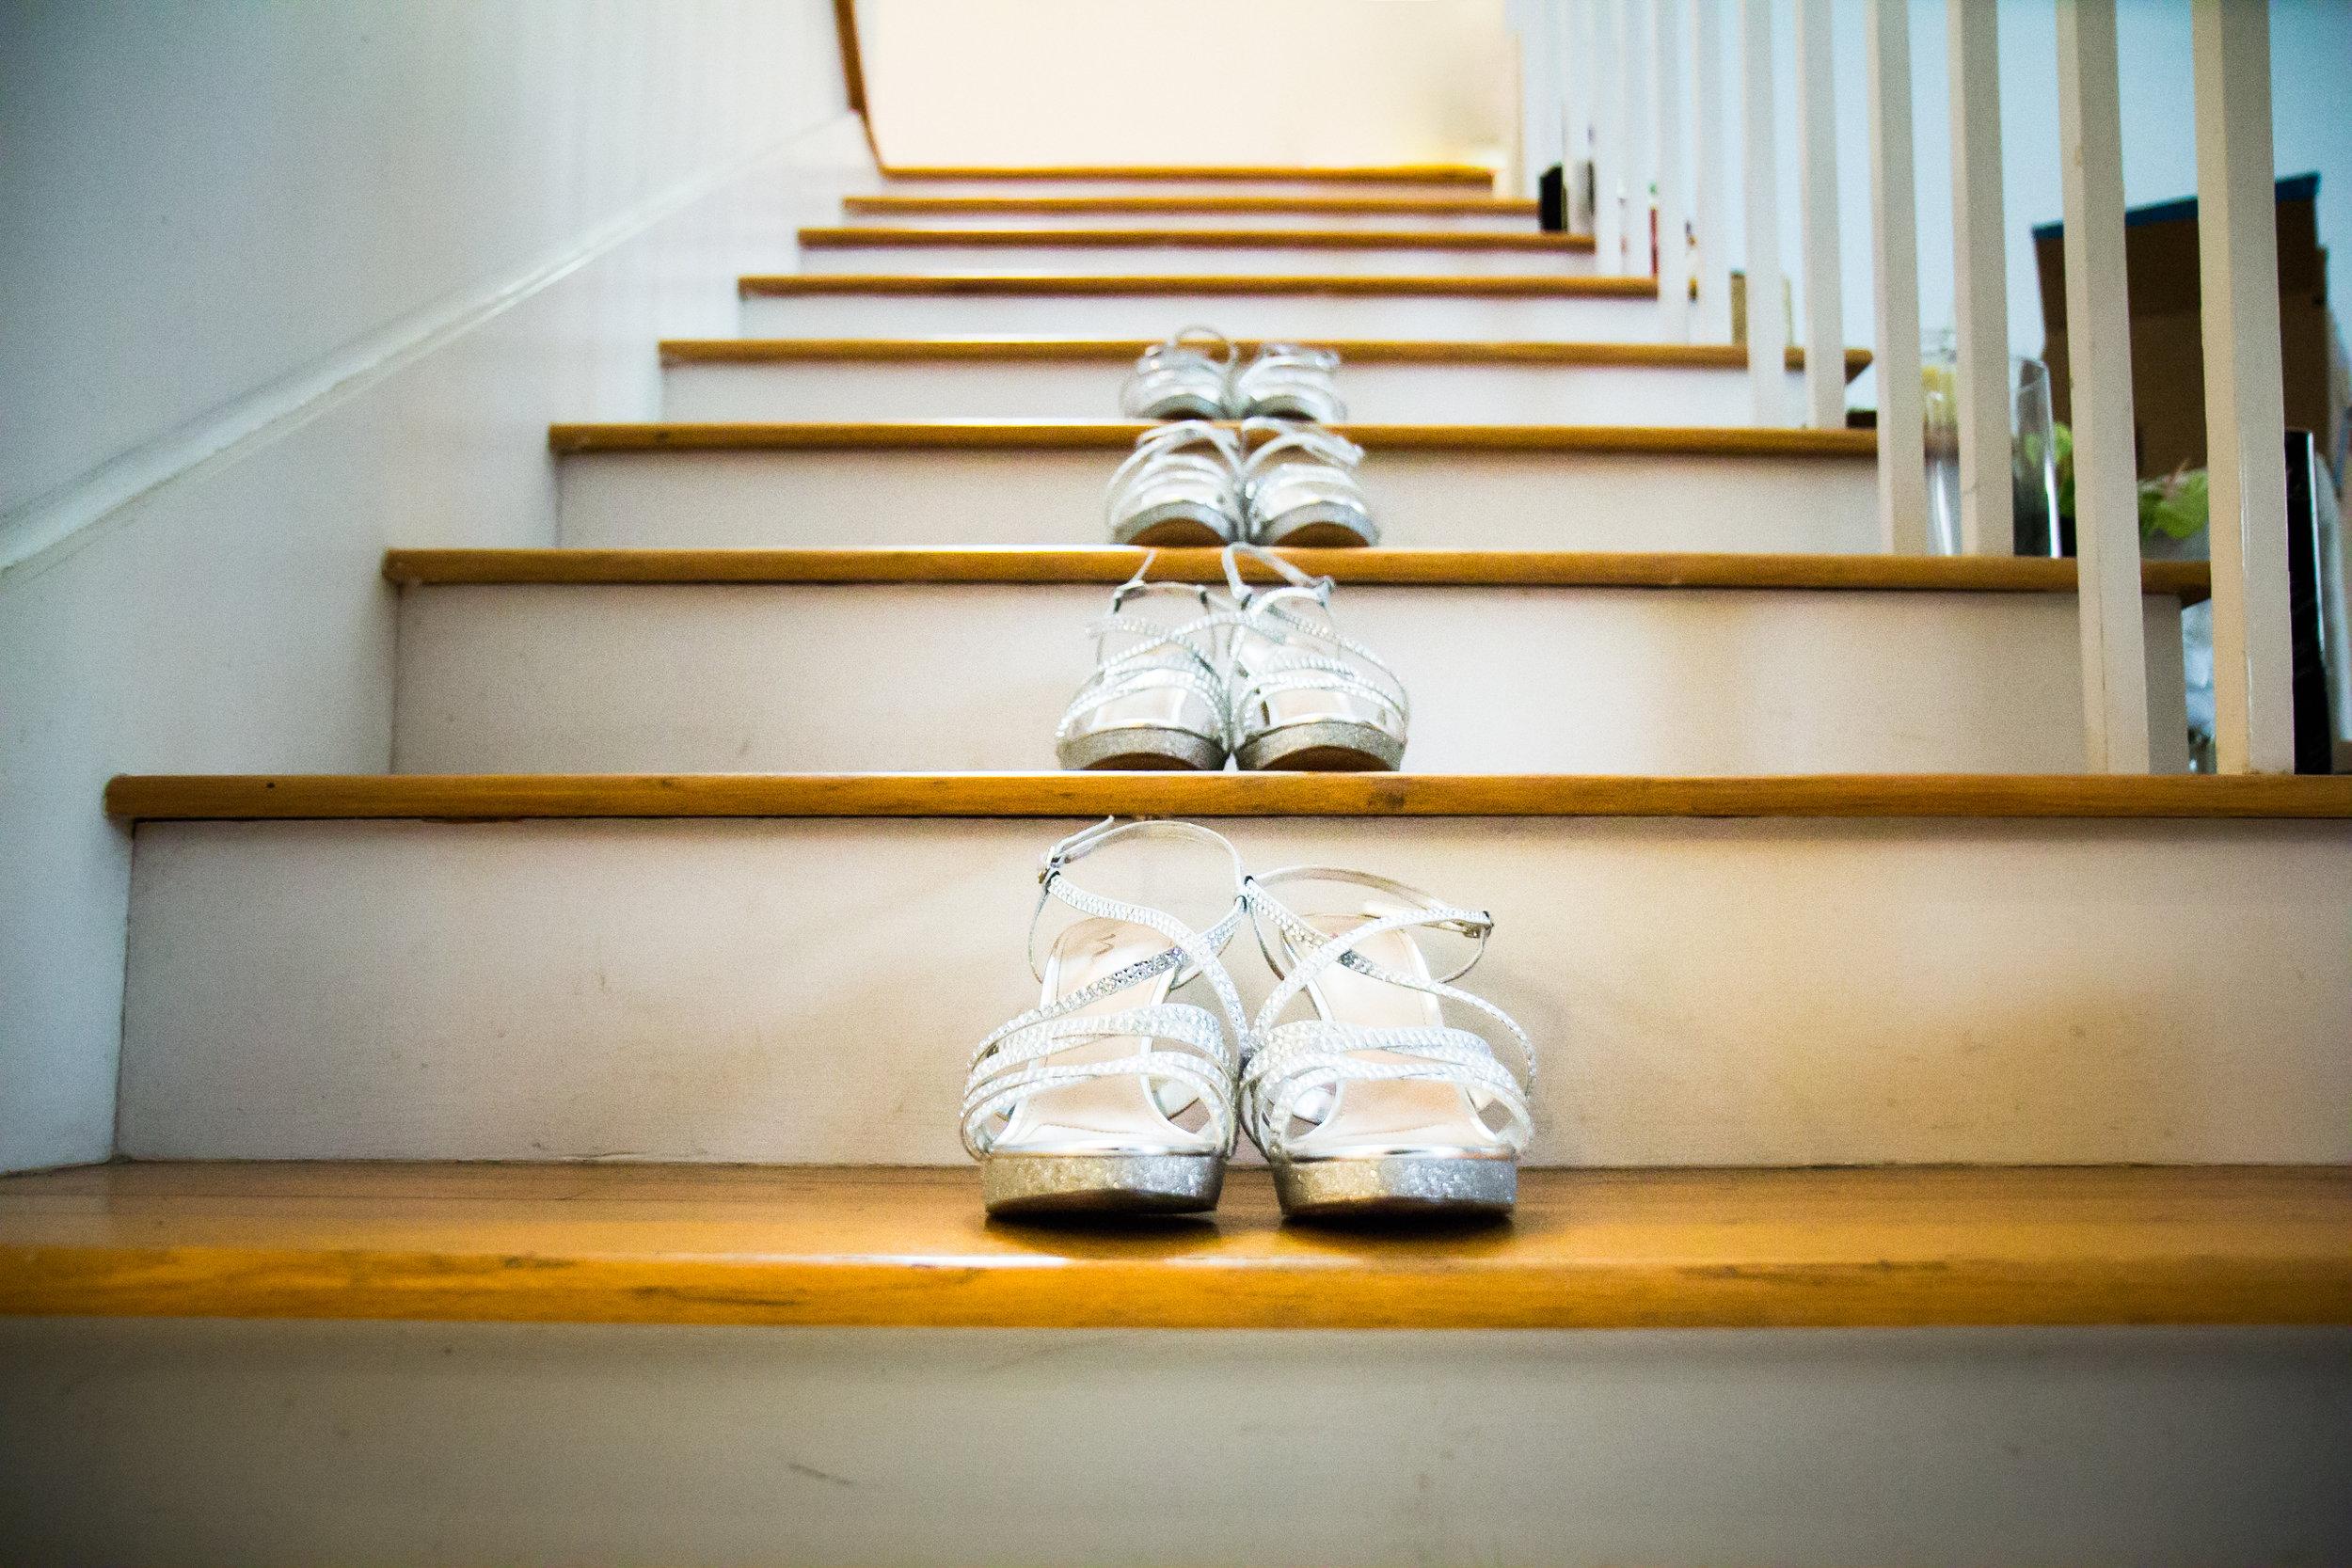 Key West Wedding Shoes on Stairwell.jpg